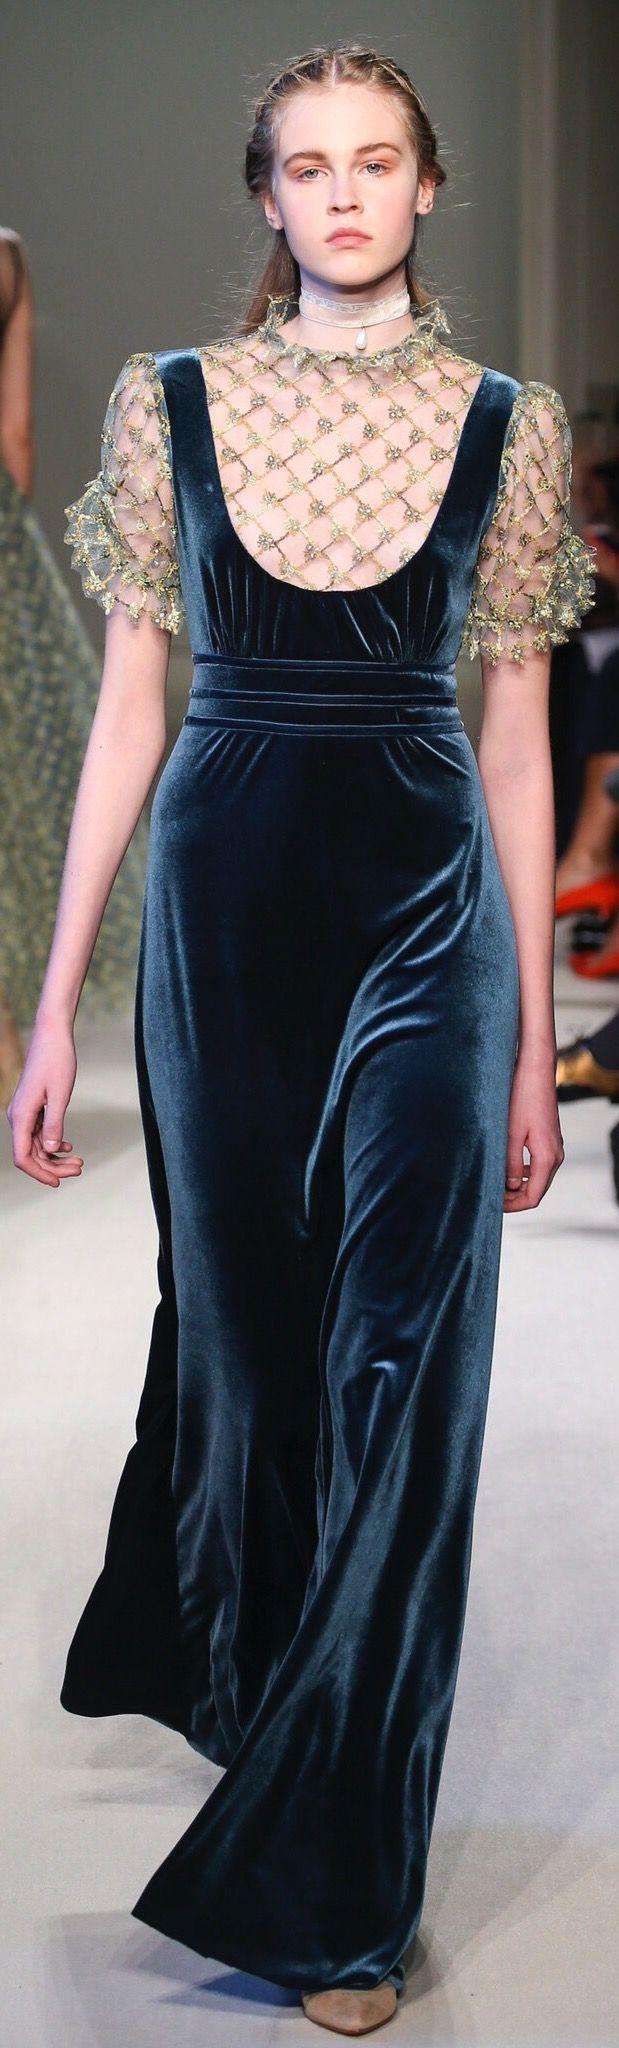 Luisa Beccaria, fall 2016 Ready-to-Wear